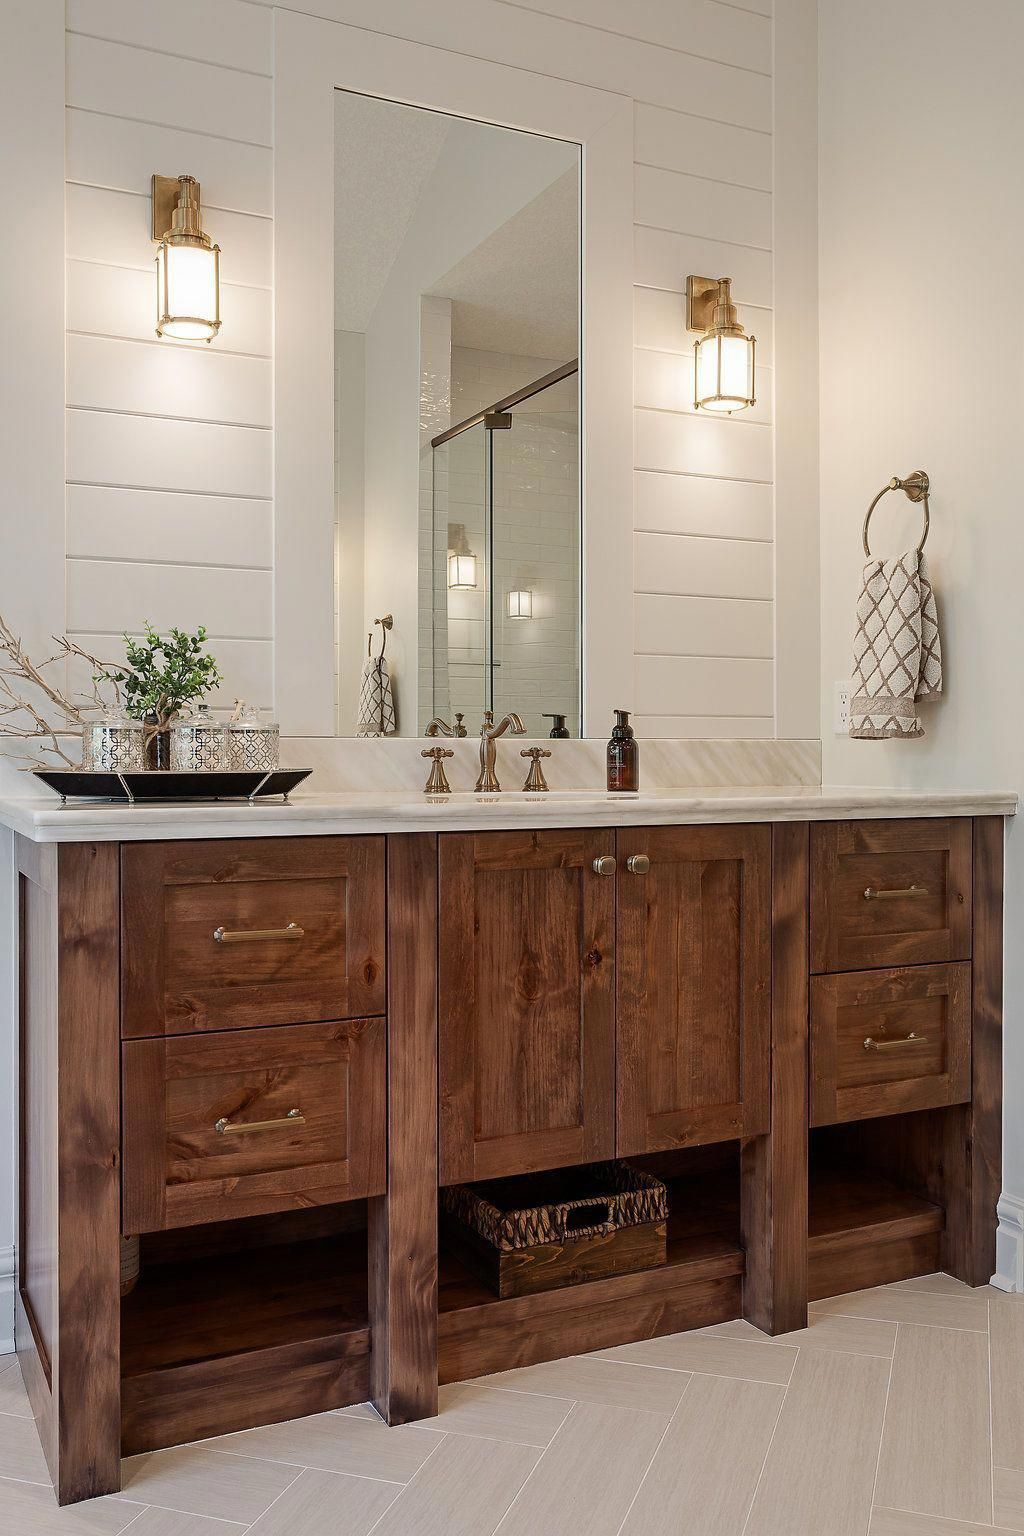 Custom Bathroom Vanity Ideas For Your Home Diybathroomvanity